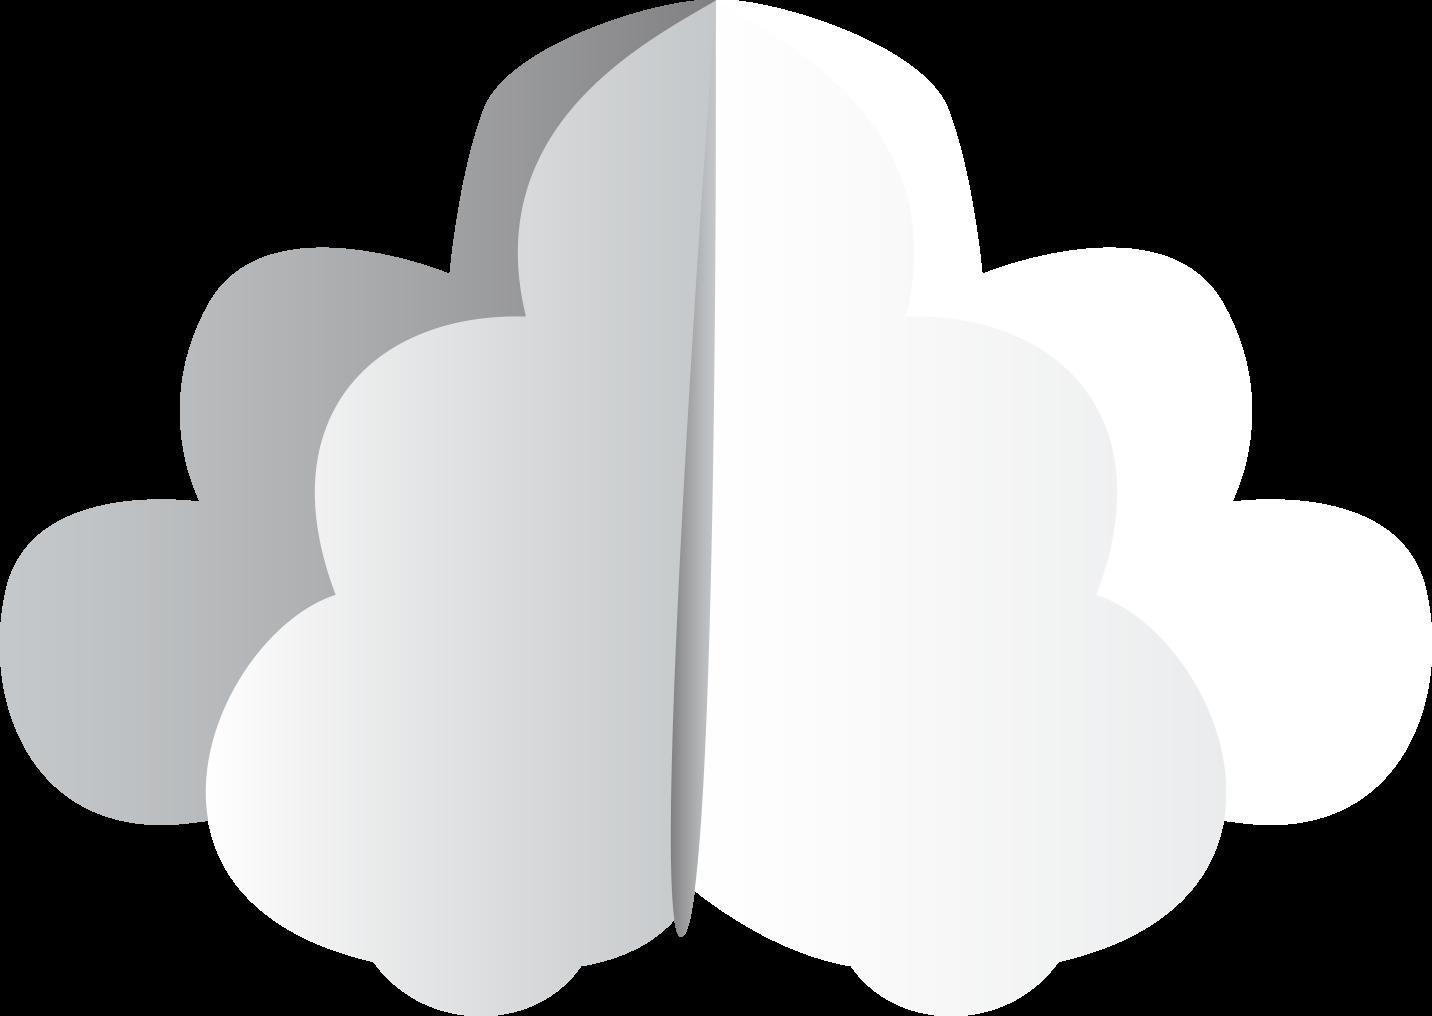 paper cloud icon